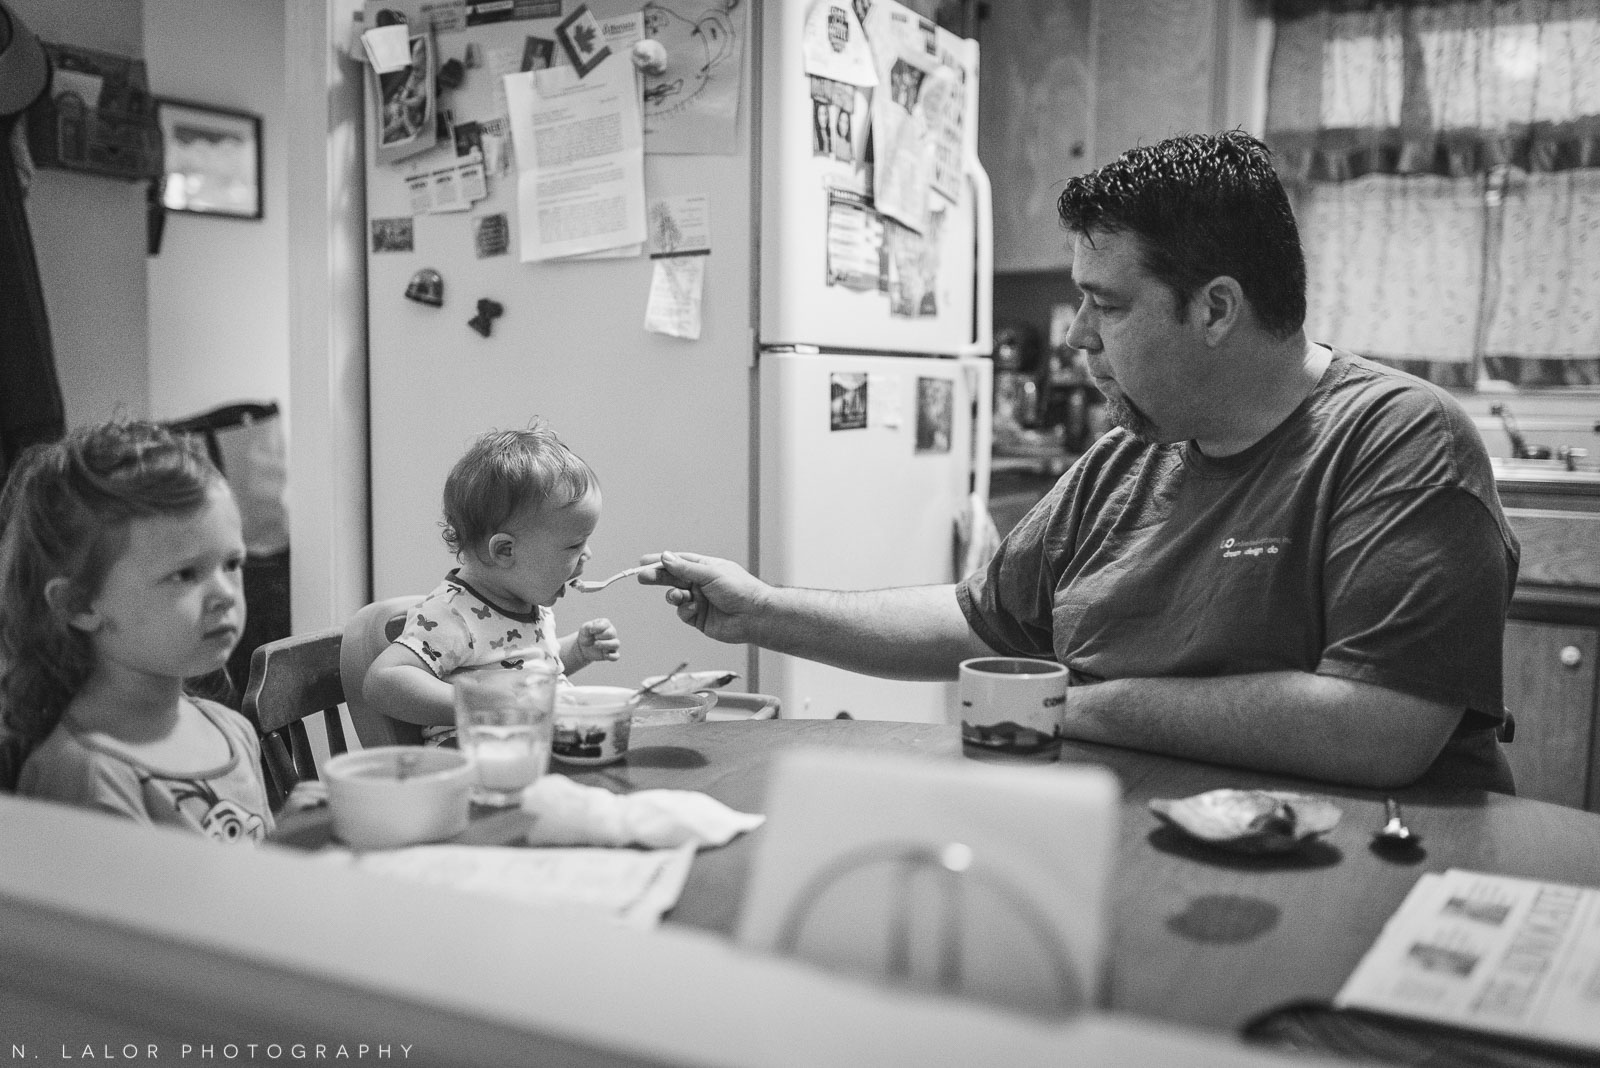 nlalor-photography-2015-one-morning-kim-documentary-photo-session-7.jpg